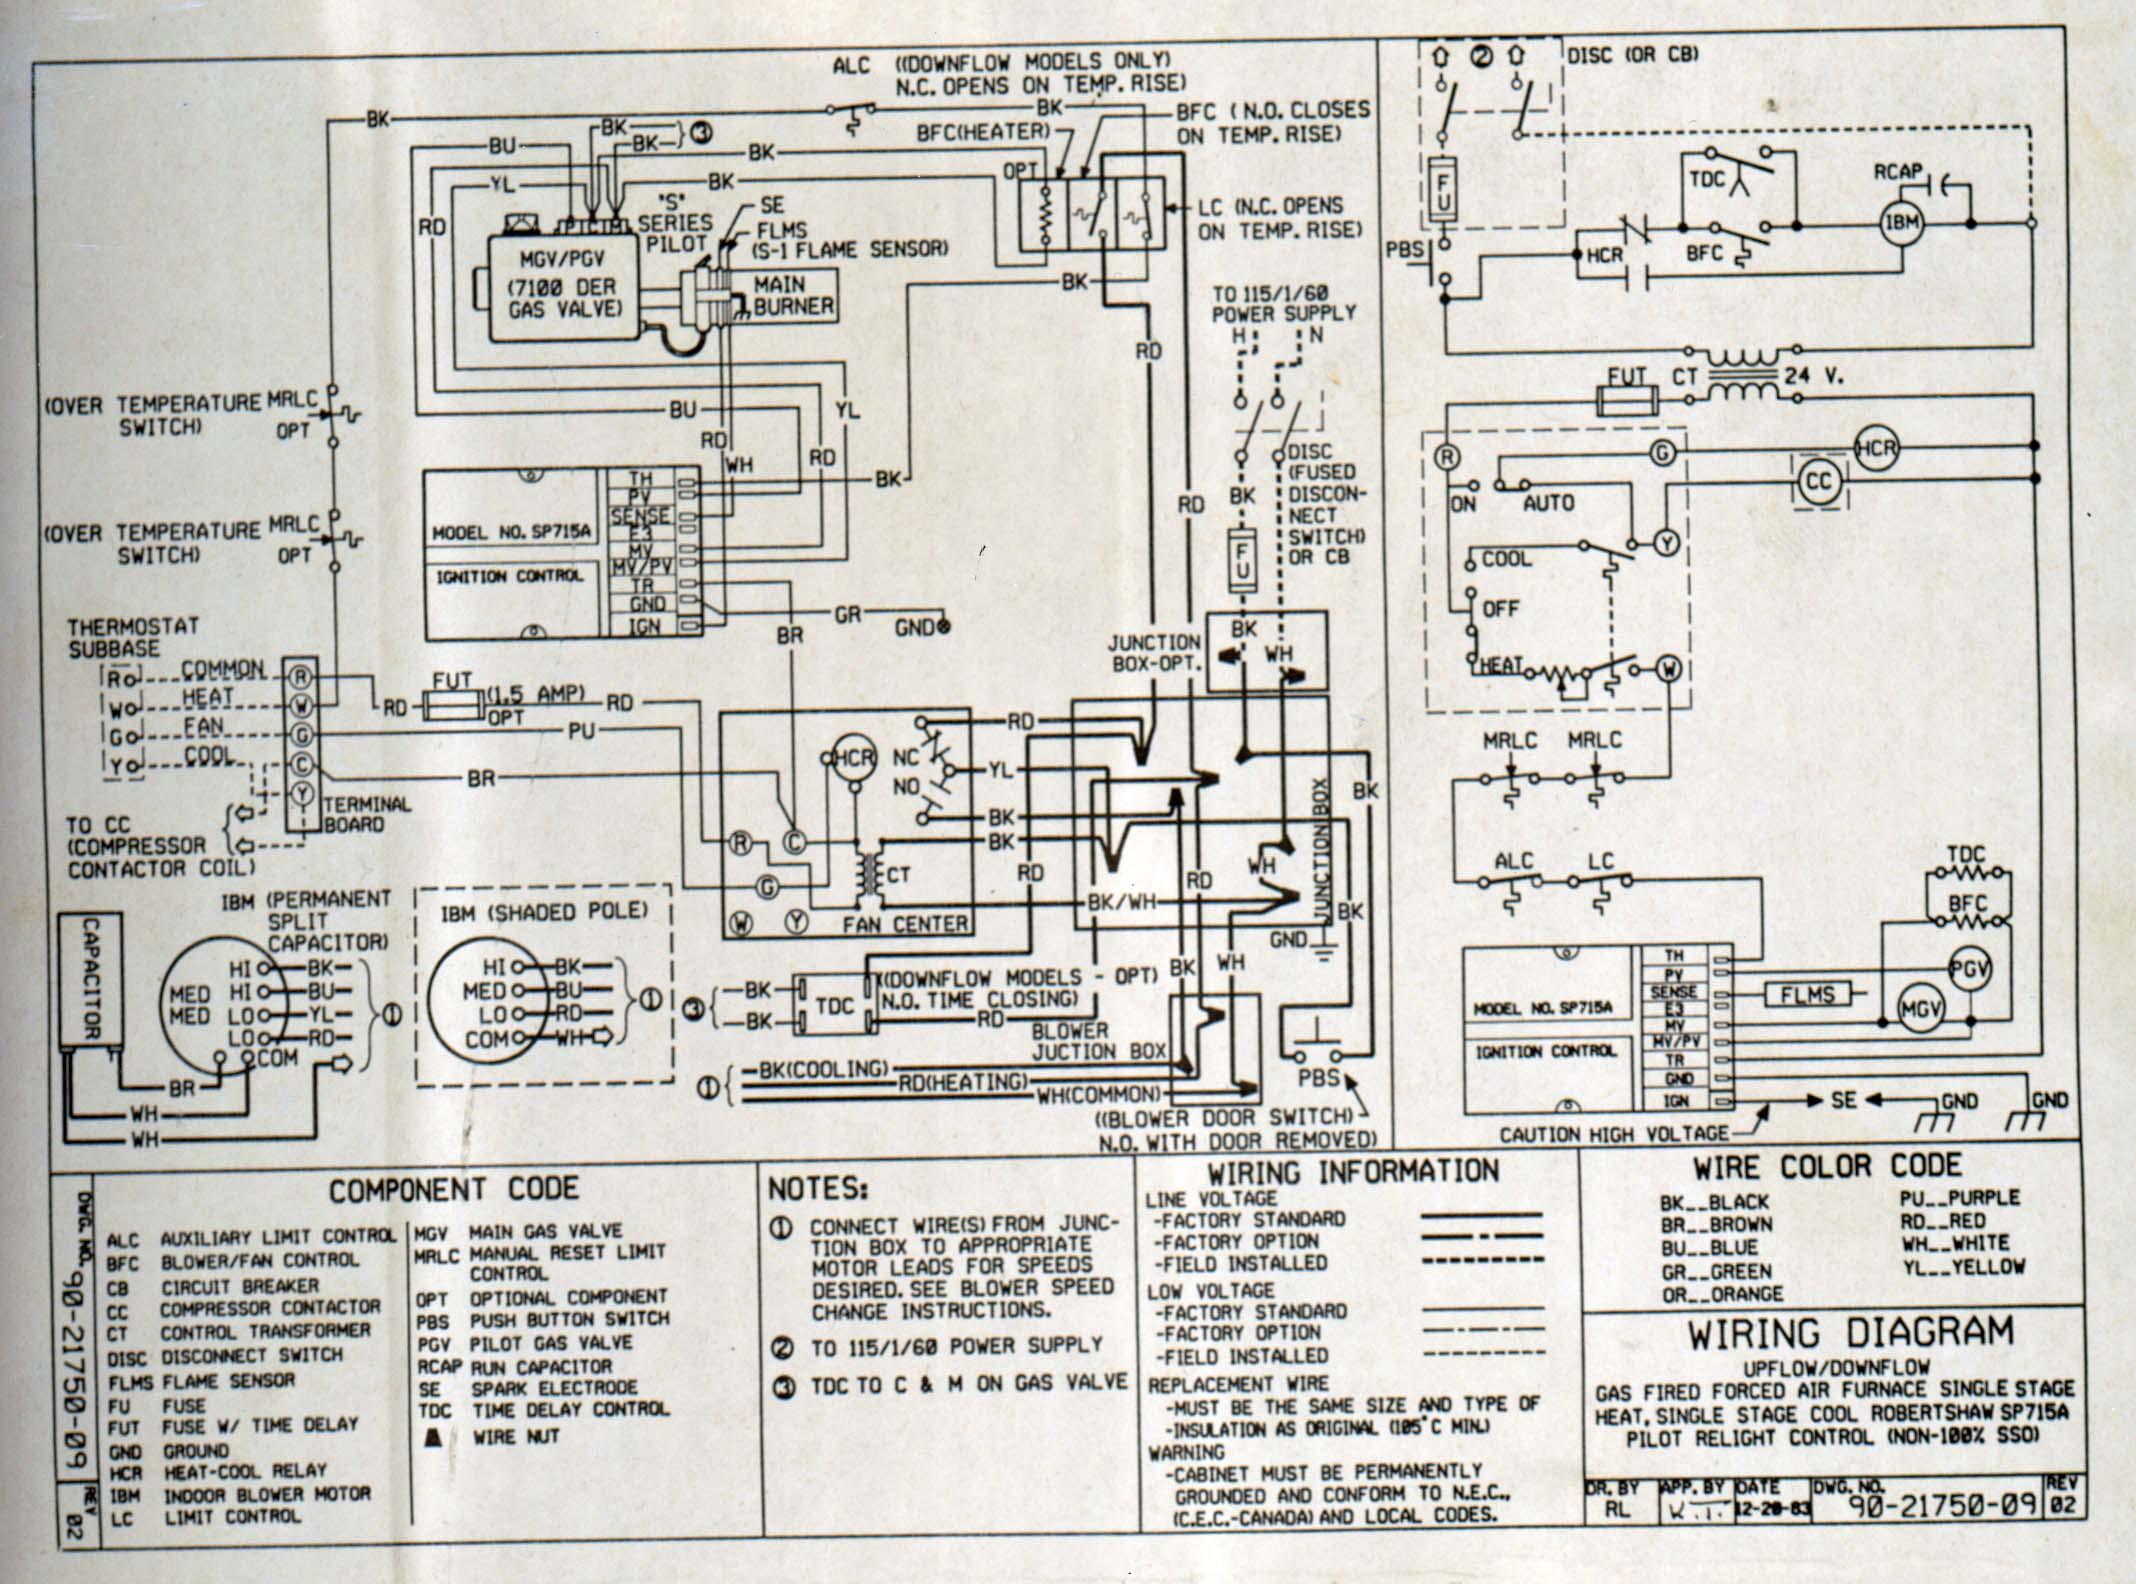 Wiring Diagram For Lennox Furnace Wiring Diagrams – Lennox Furnace Thermostat Wiring